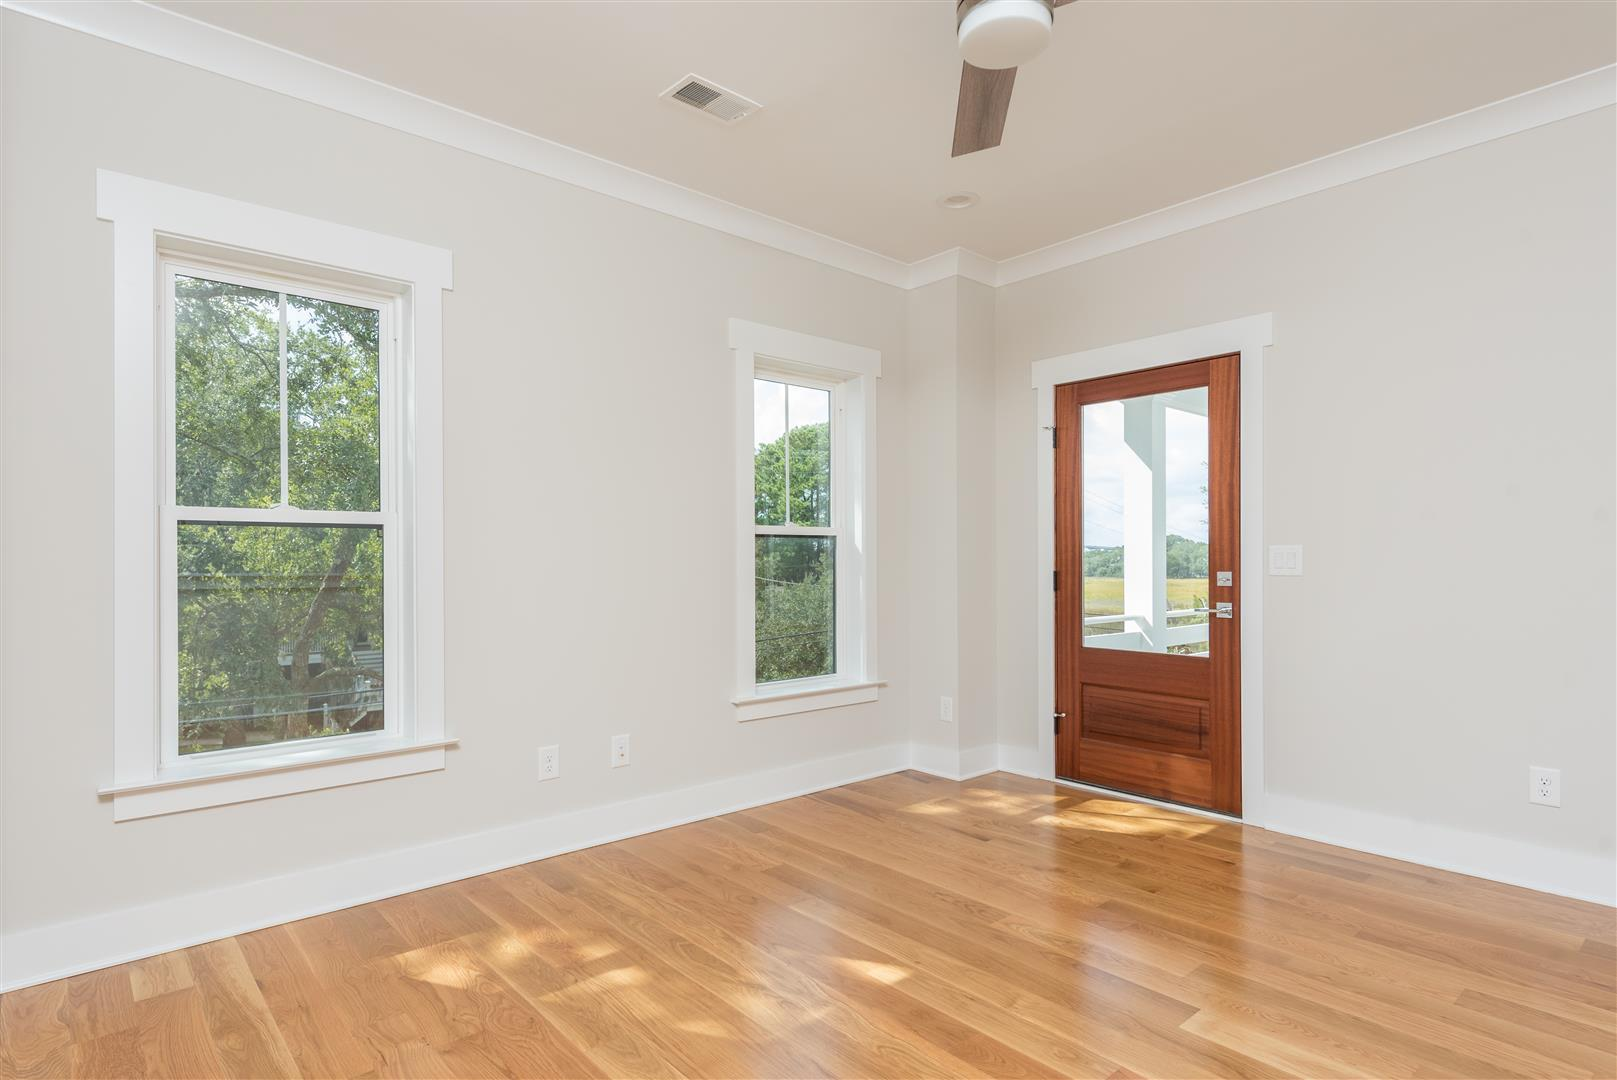 Scanlonville Homes For Sale - 160 5th, Mount Pleasant, SC - 21